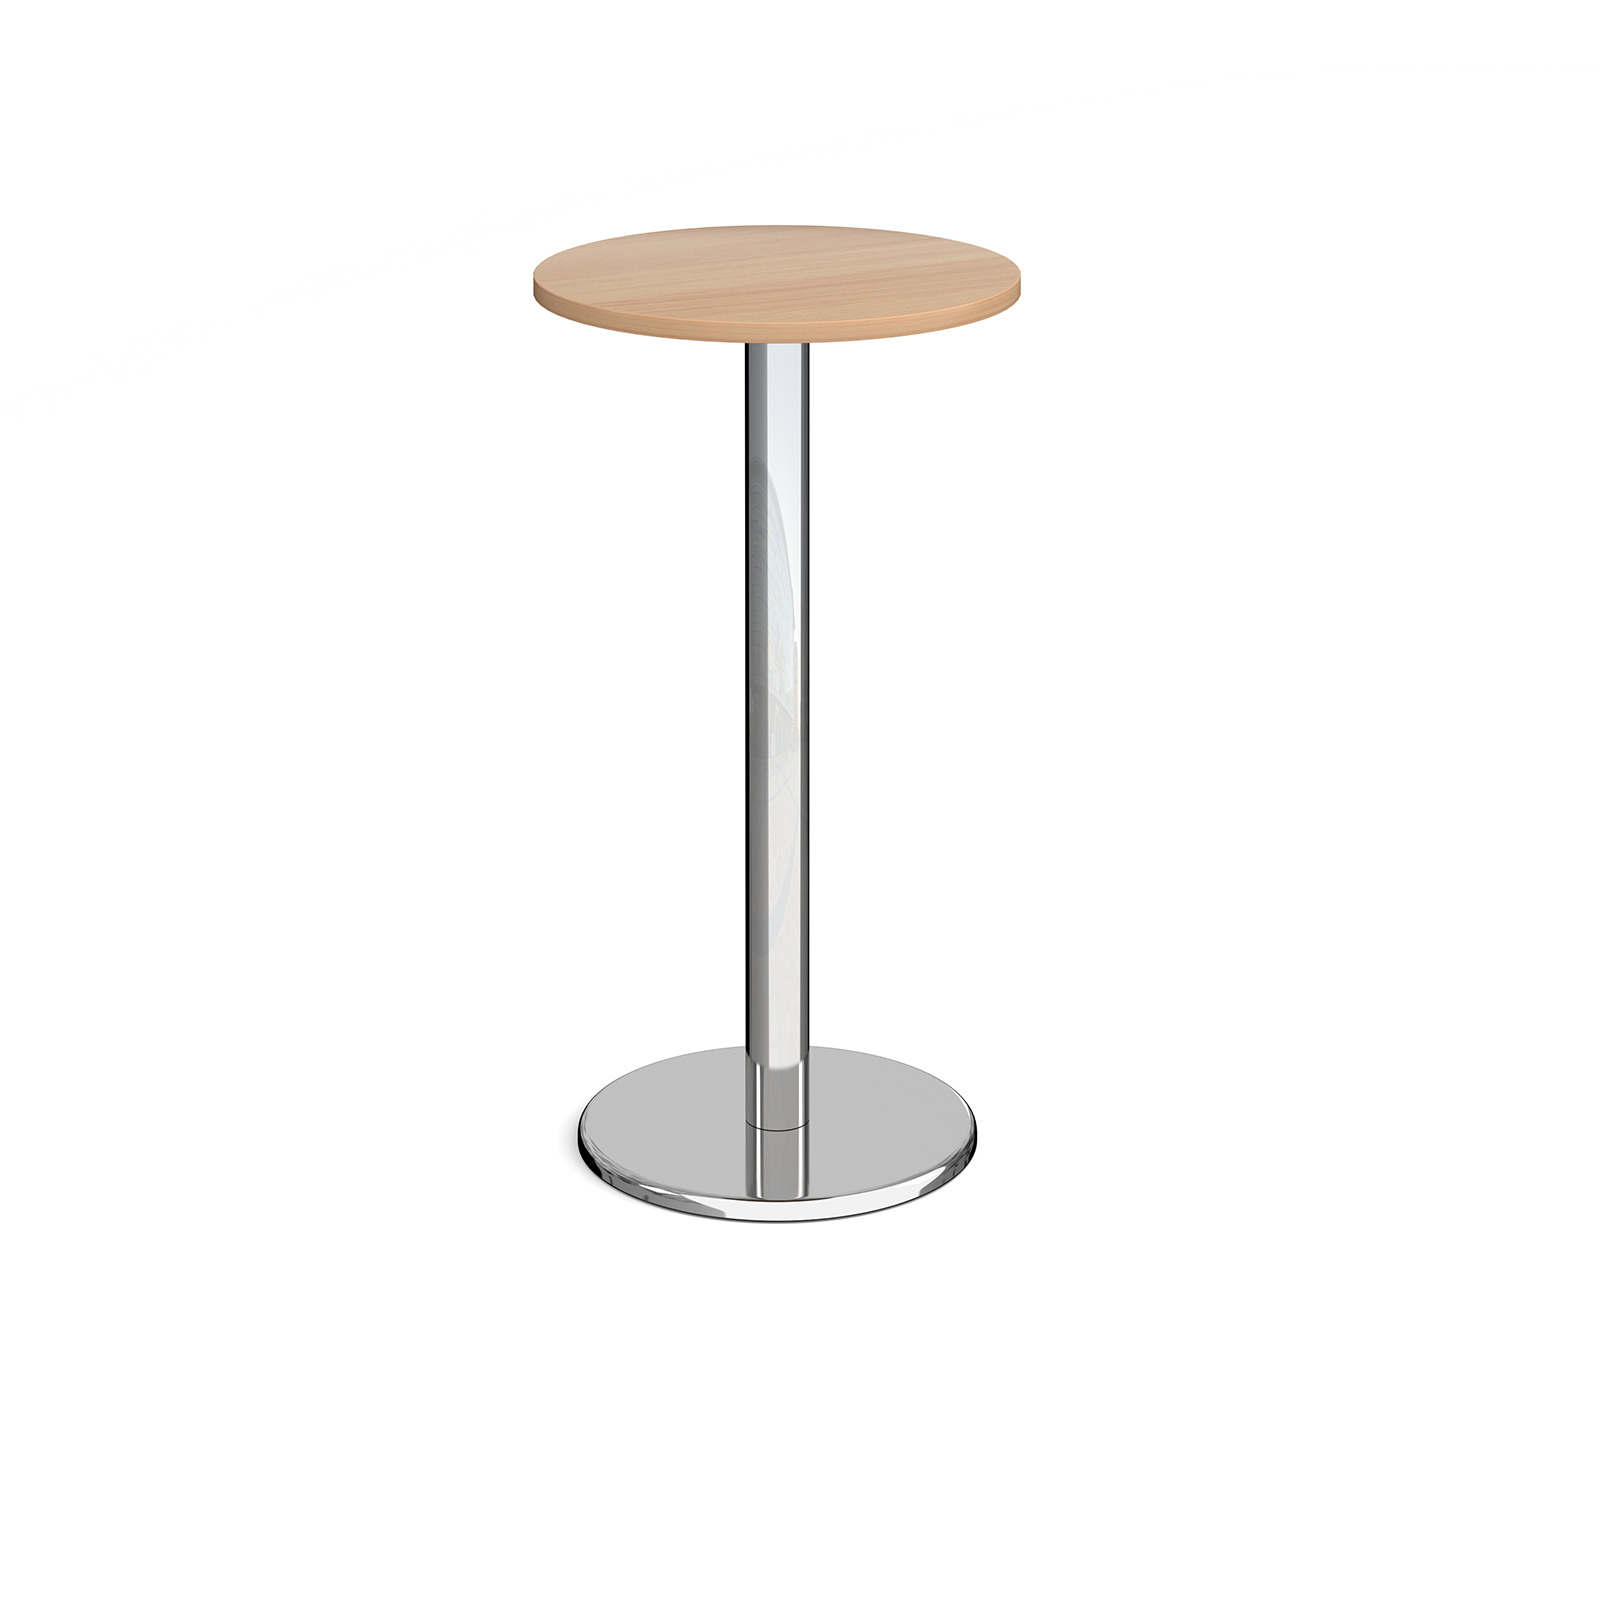 Pisa circular poseur table with round base